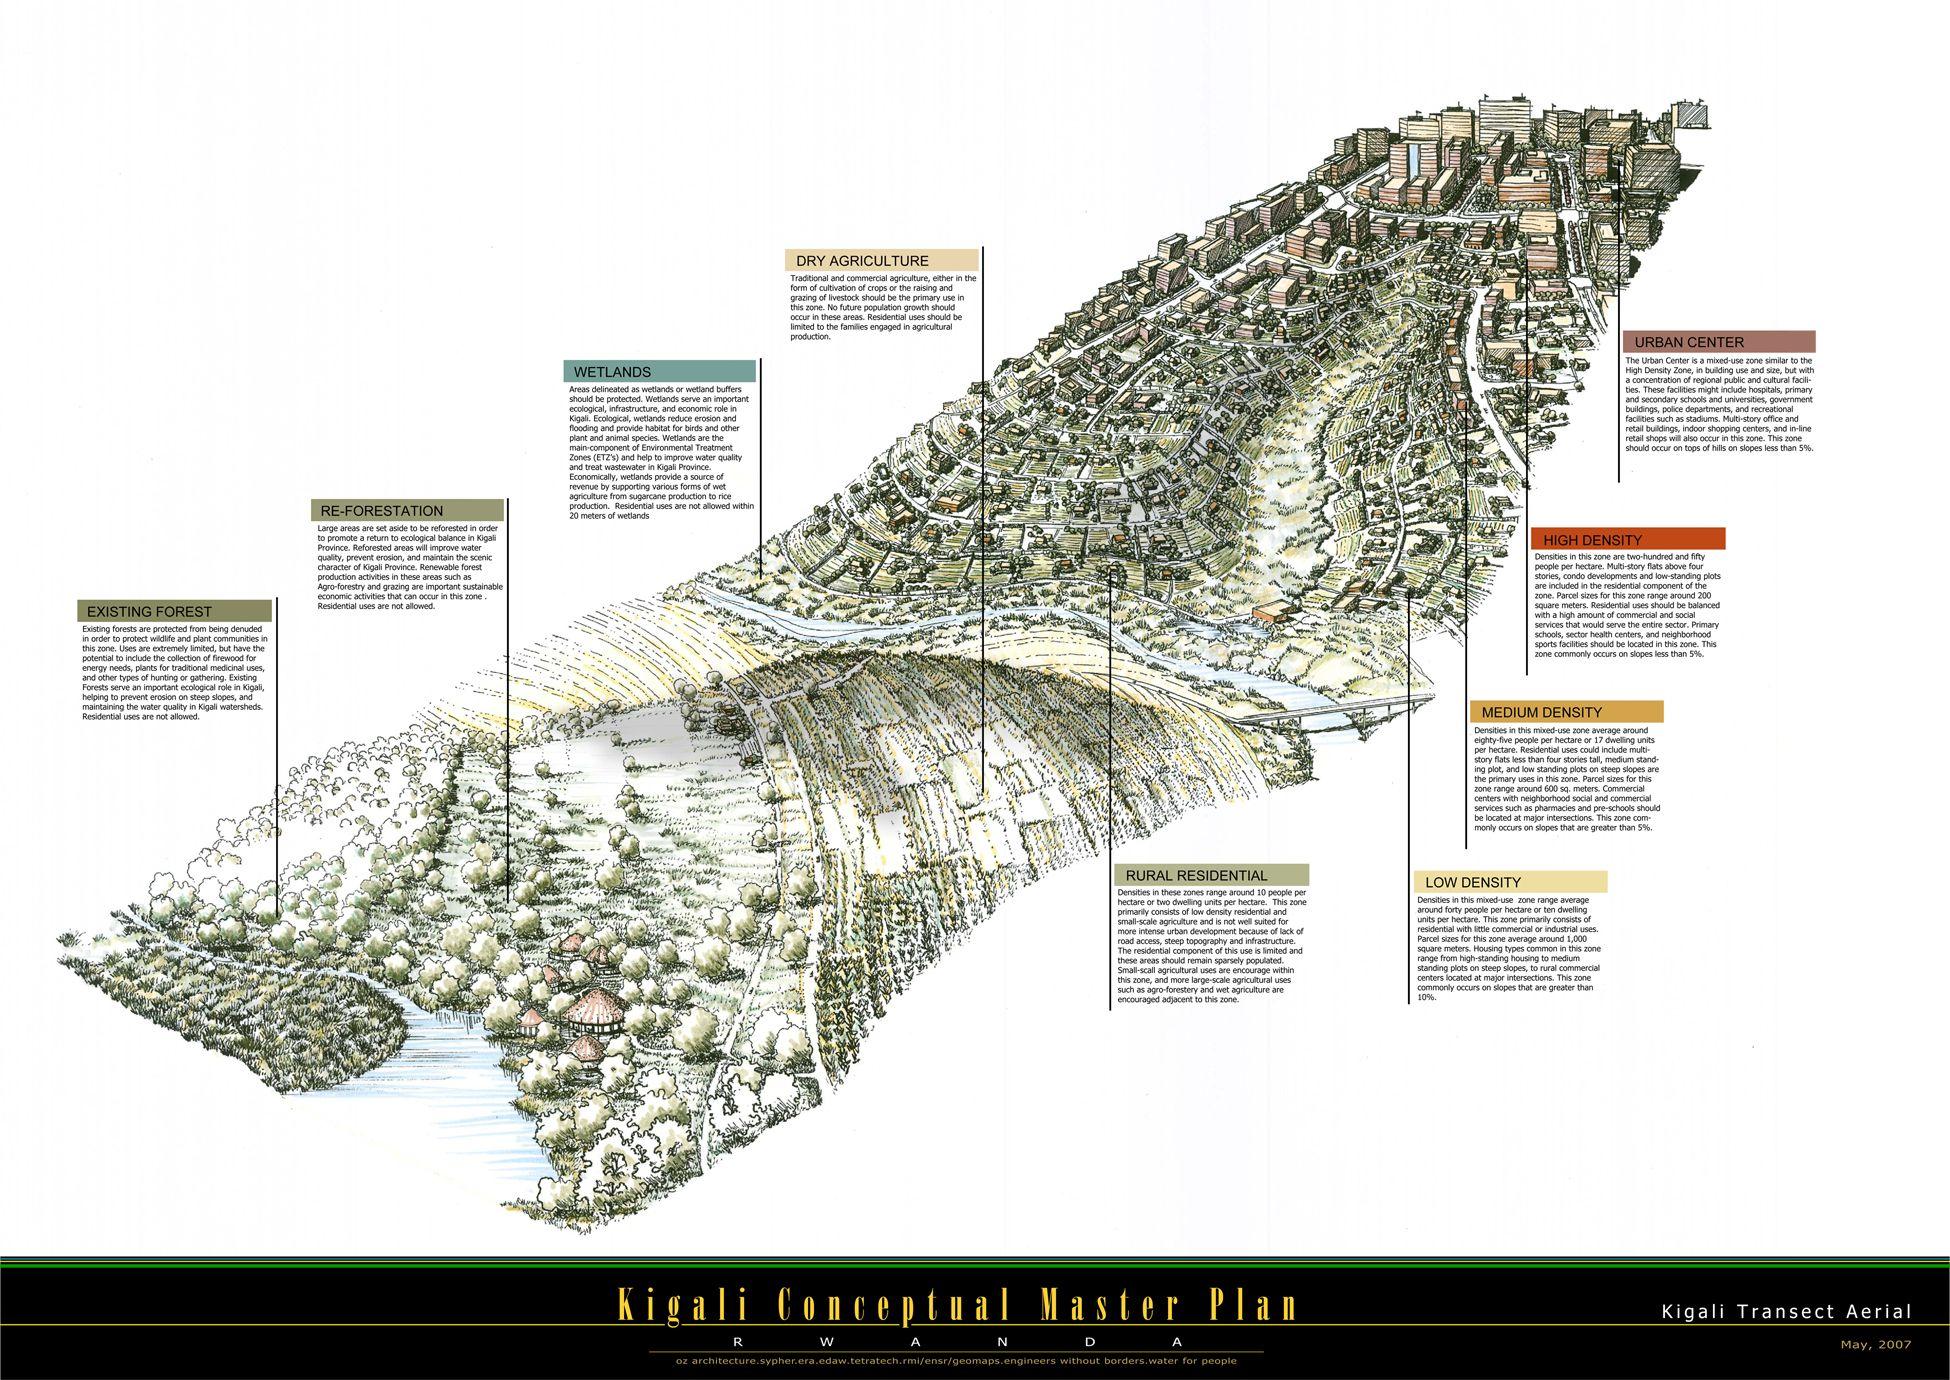 Kigali Conceptual Master Plan Kigali Rwanda Africa Aecom Design